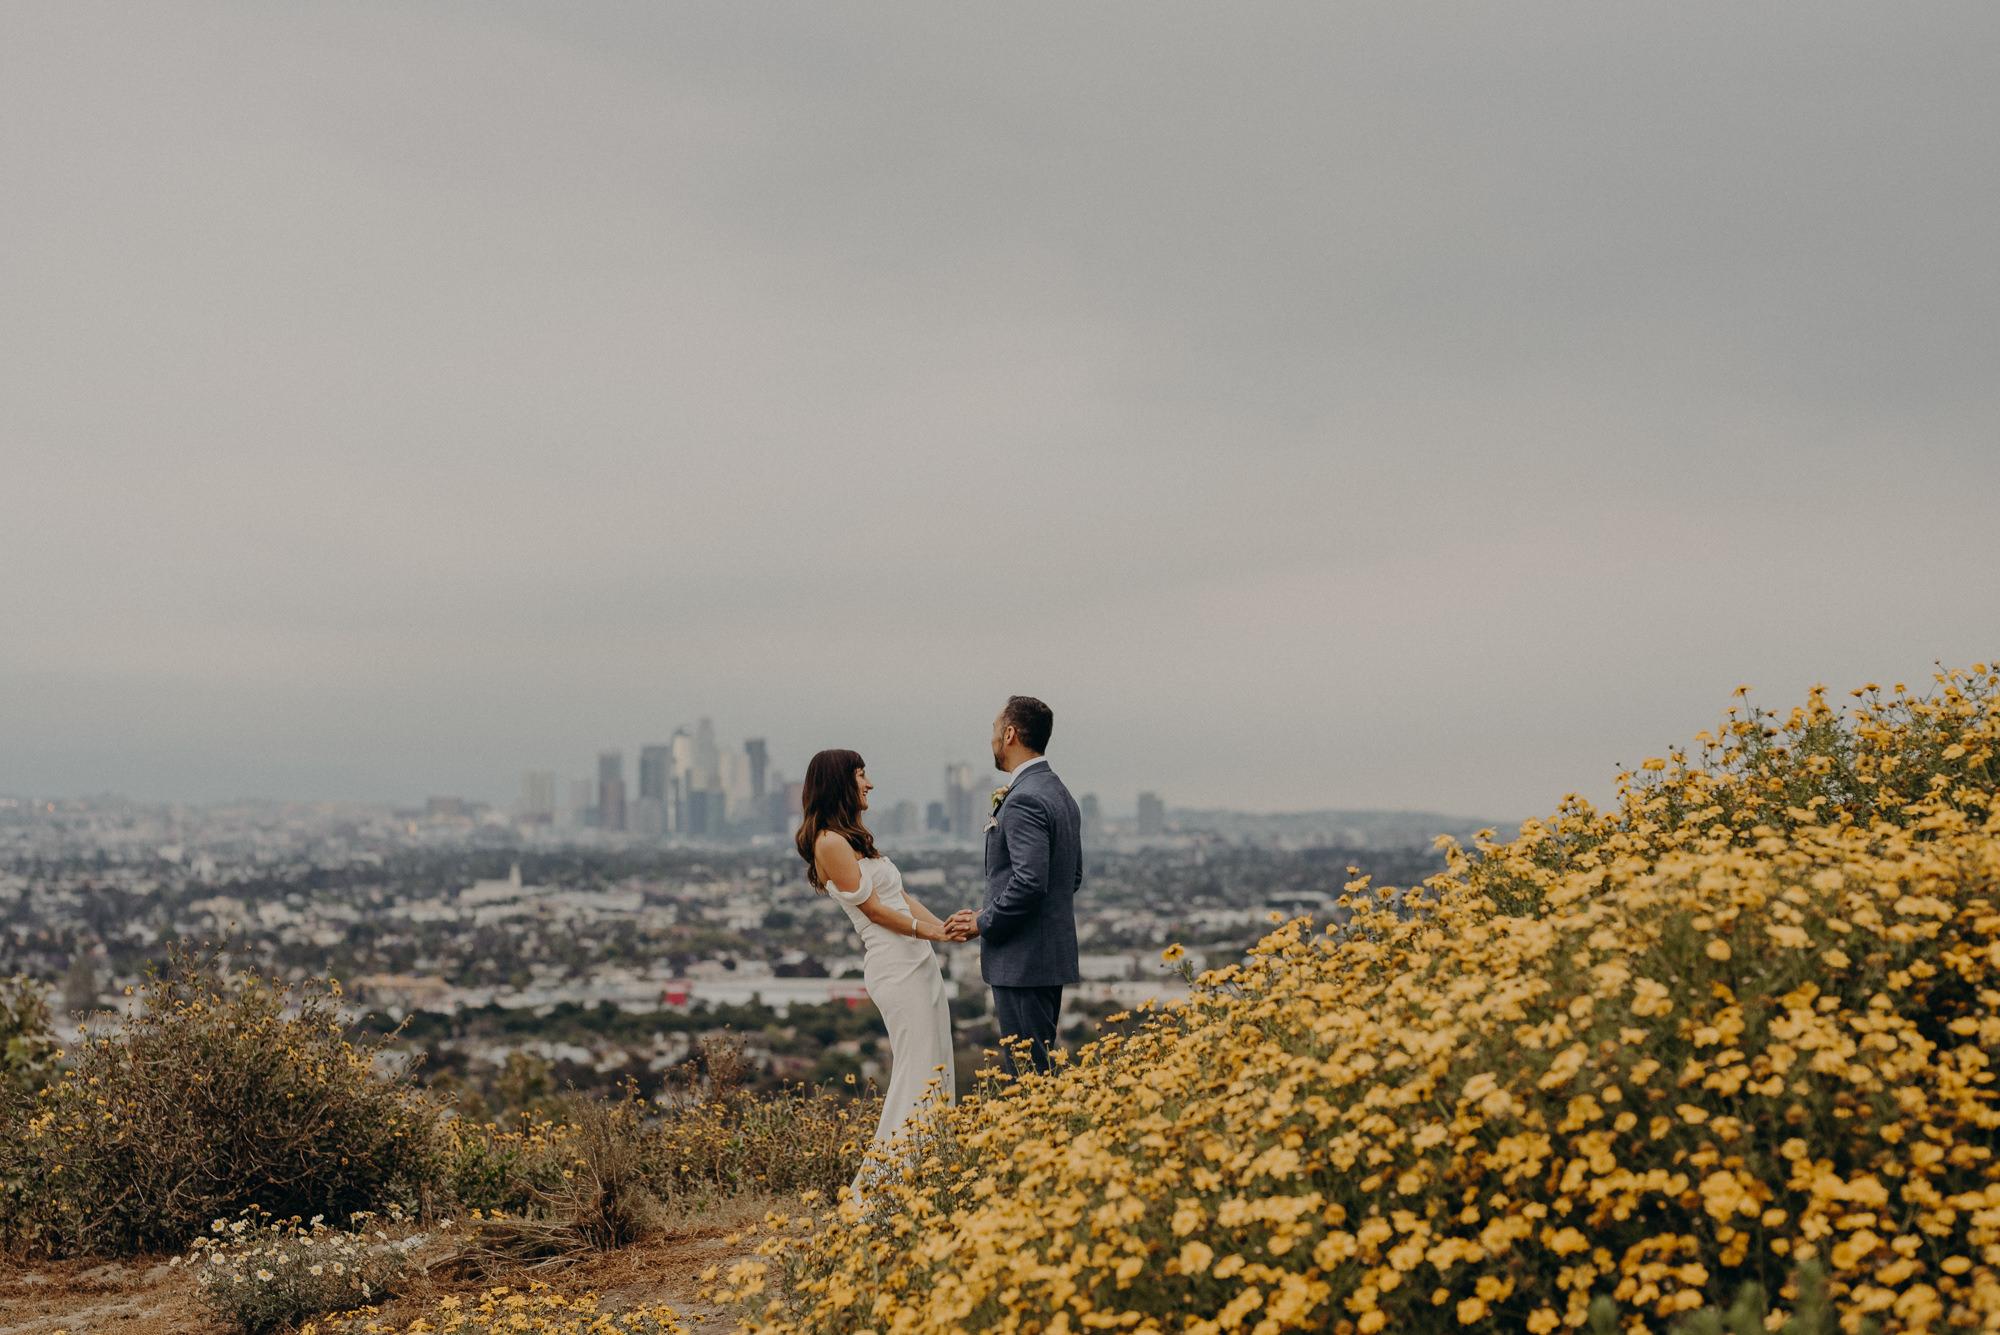 elopement photographer in los angeles - la wedding photographer - isaiahandtaylor.com-054.jpg